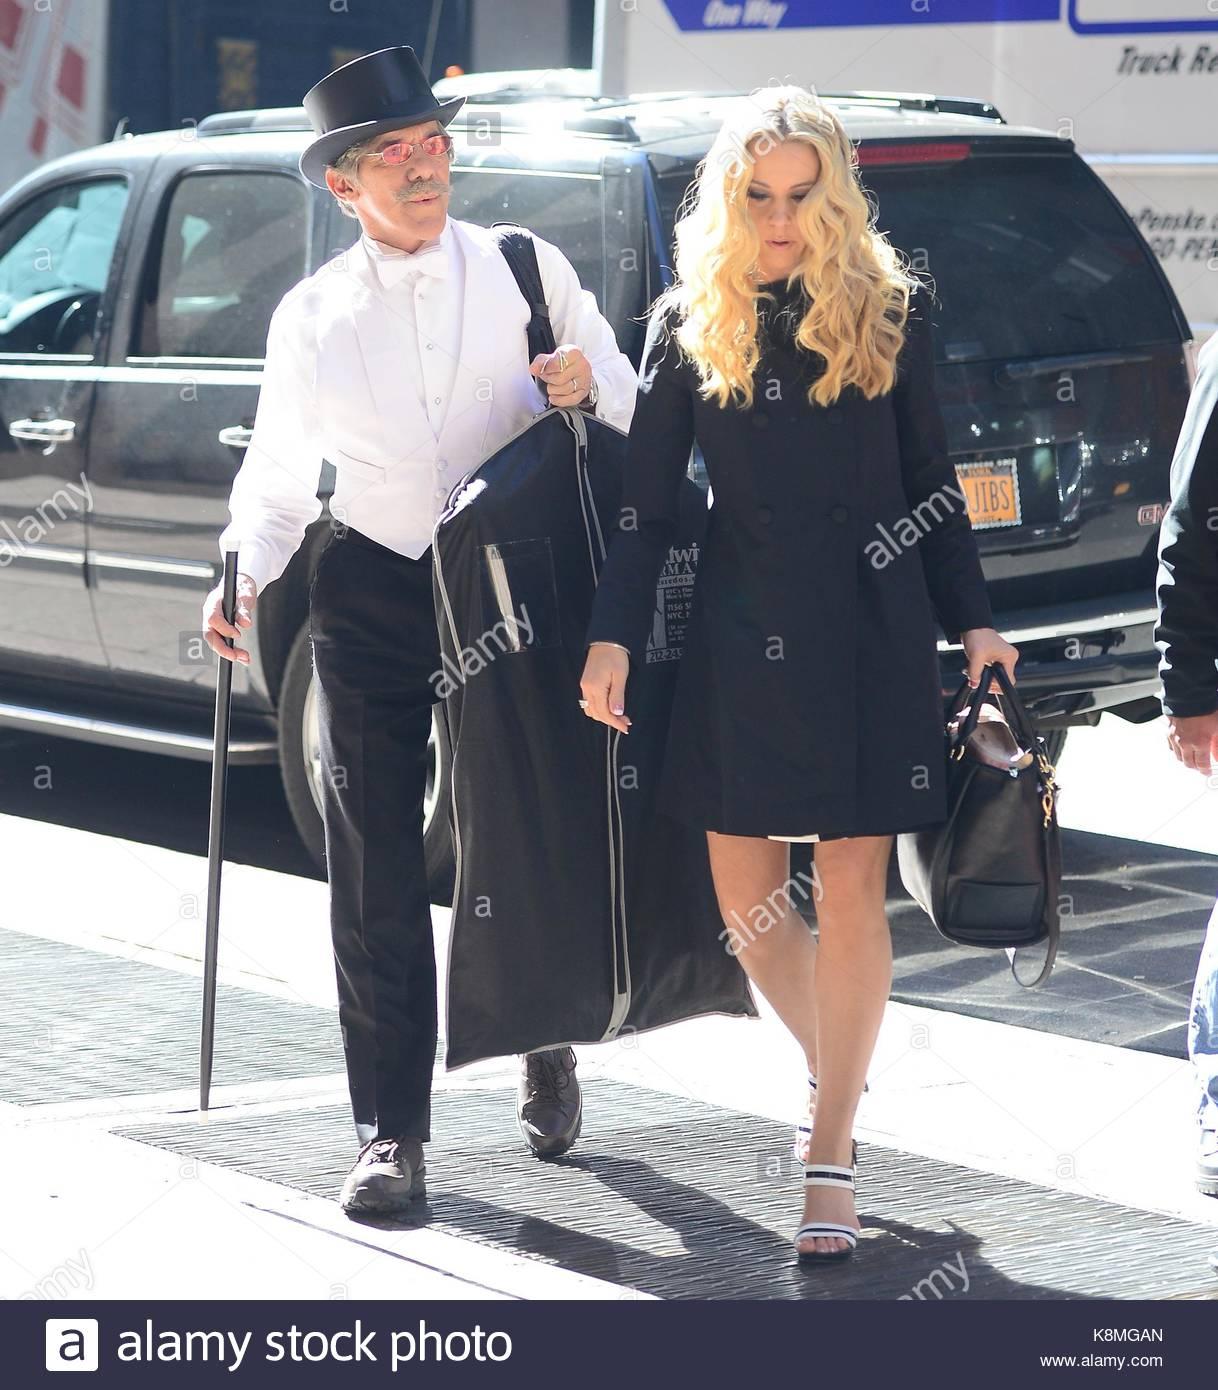 Kate dating bodyguard